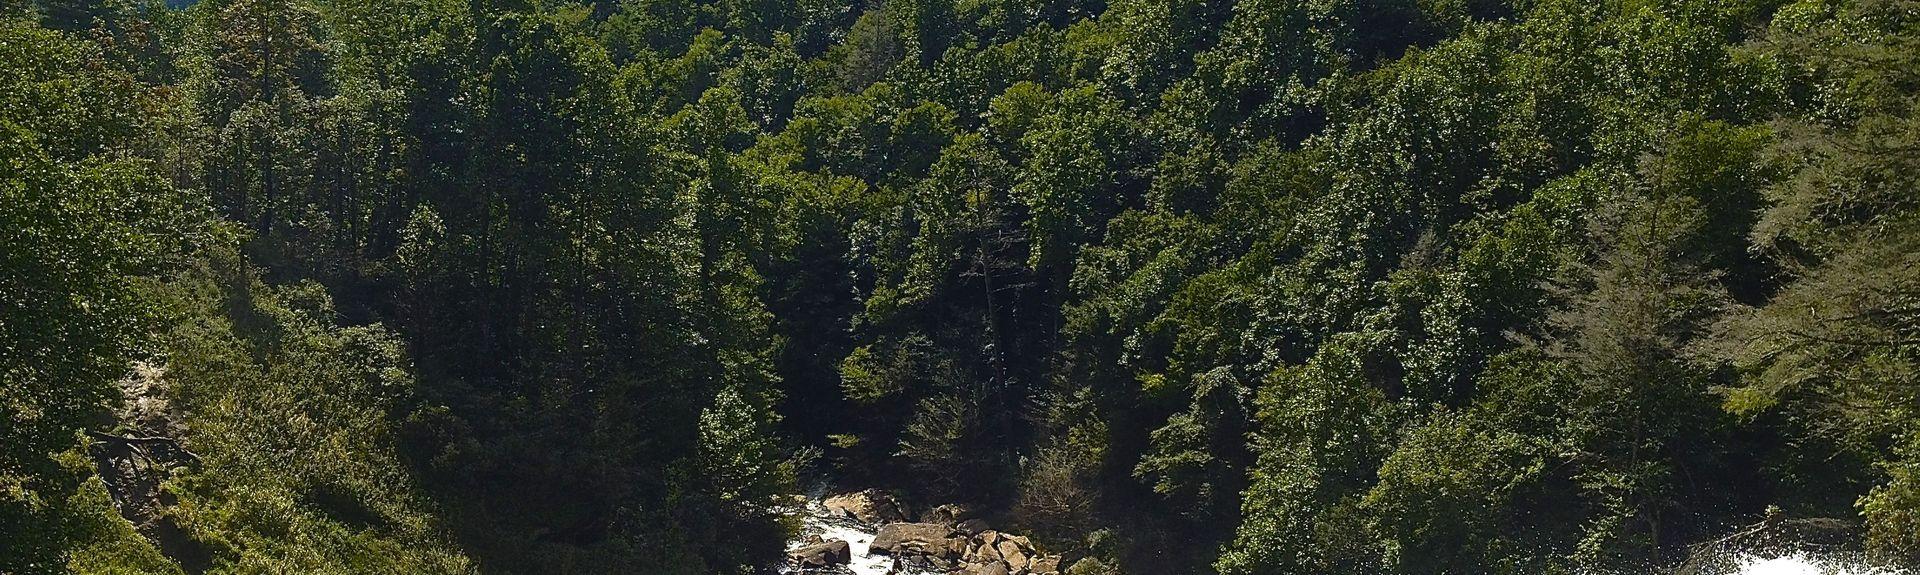 Walhalla, Νότια Καρολίνα, Ηνωμένες Πολιτείες